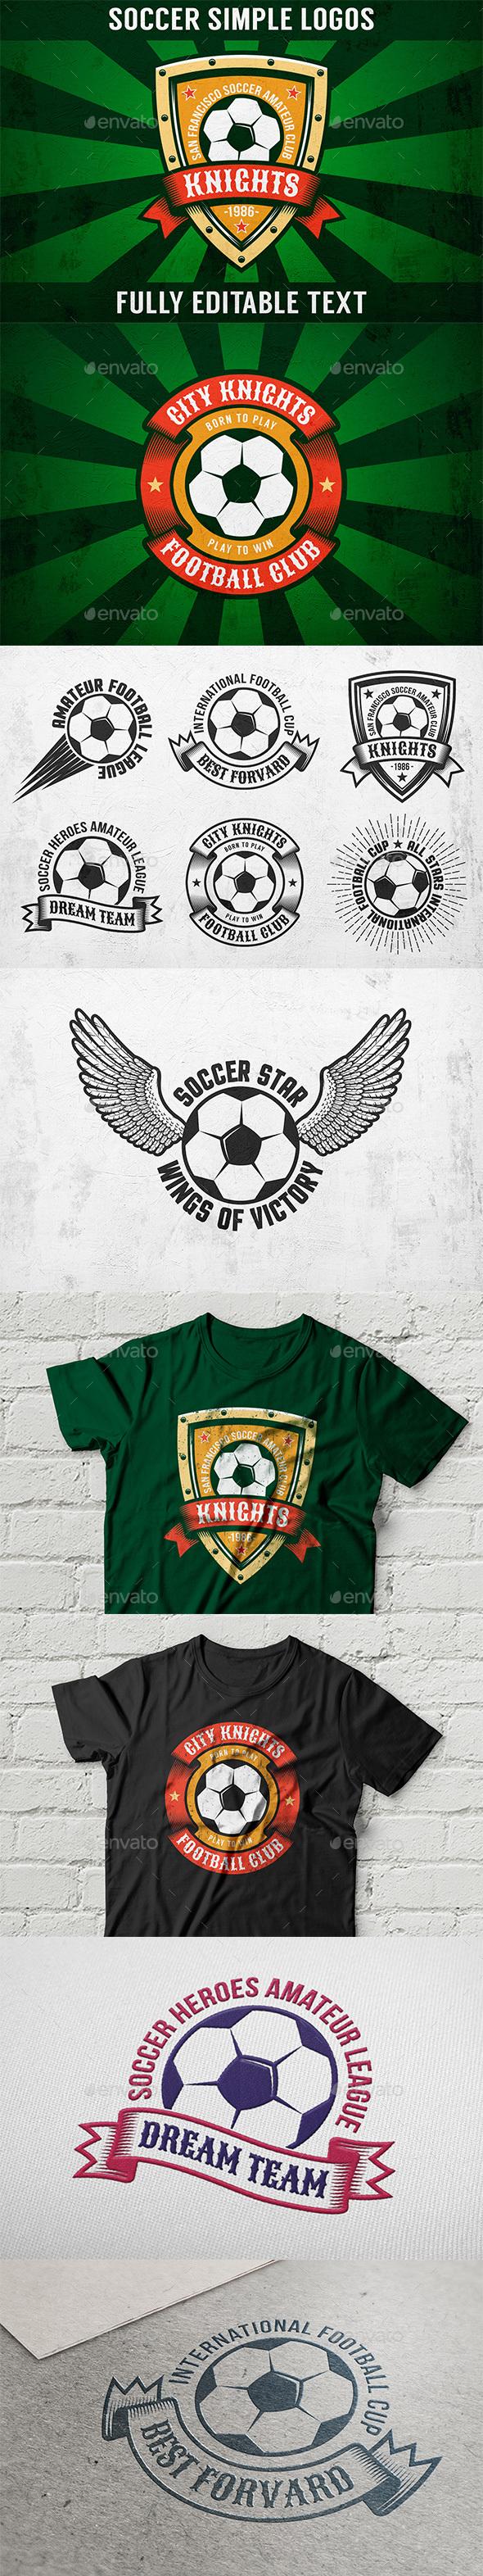 Soccer Simple Logo Set - Sports/Activity Conceptual